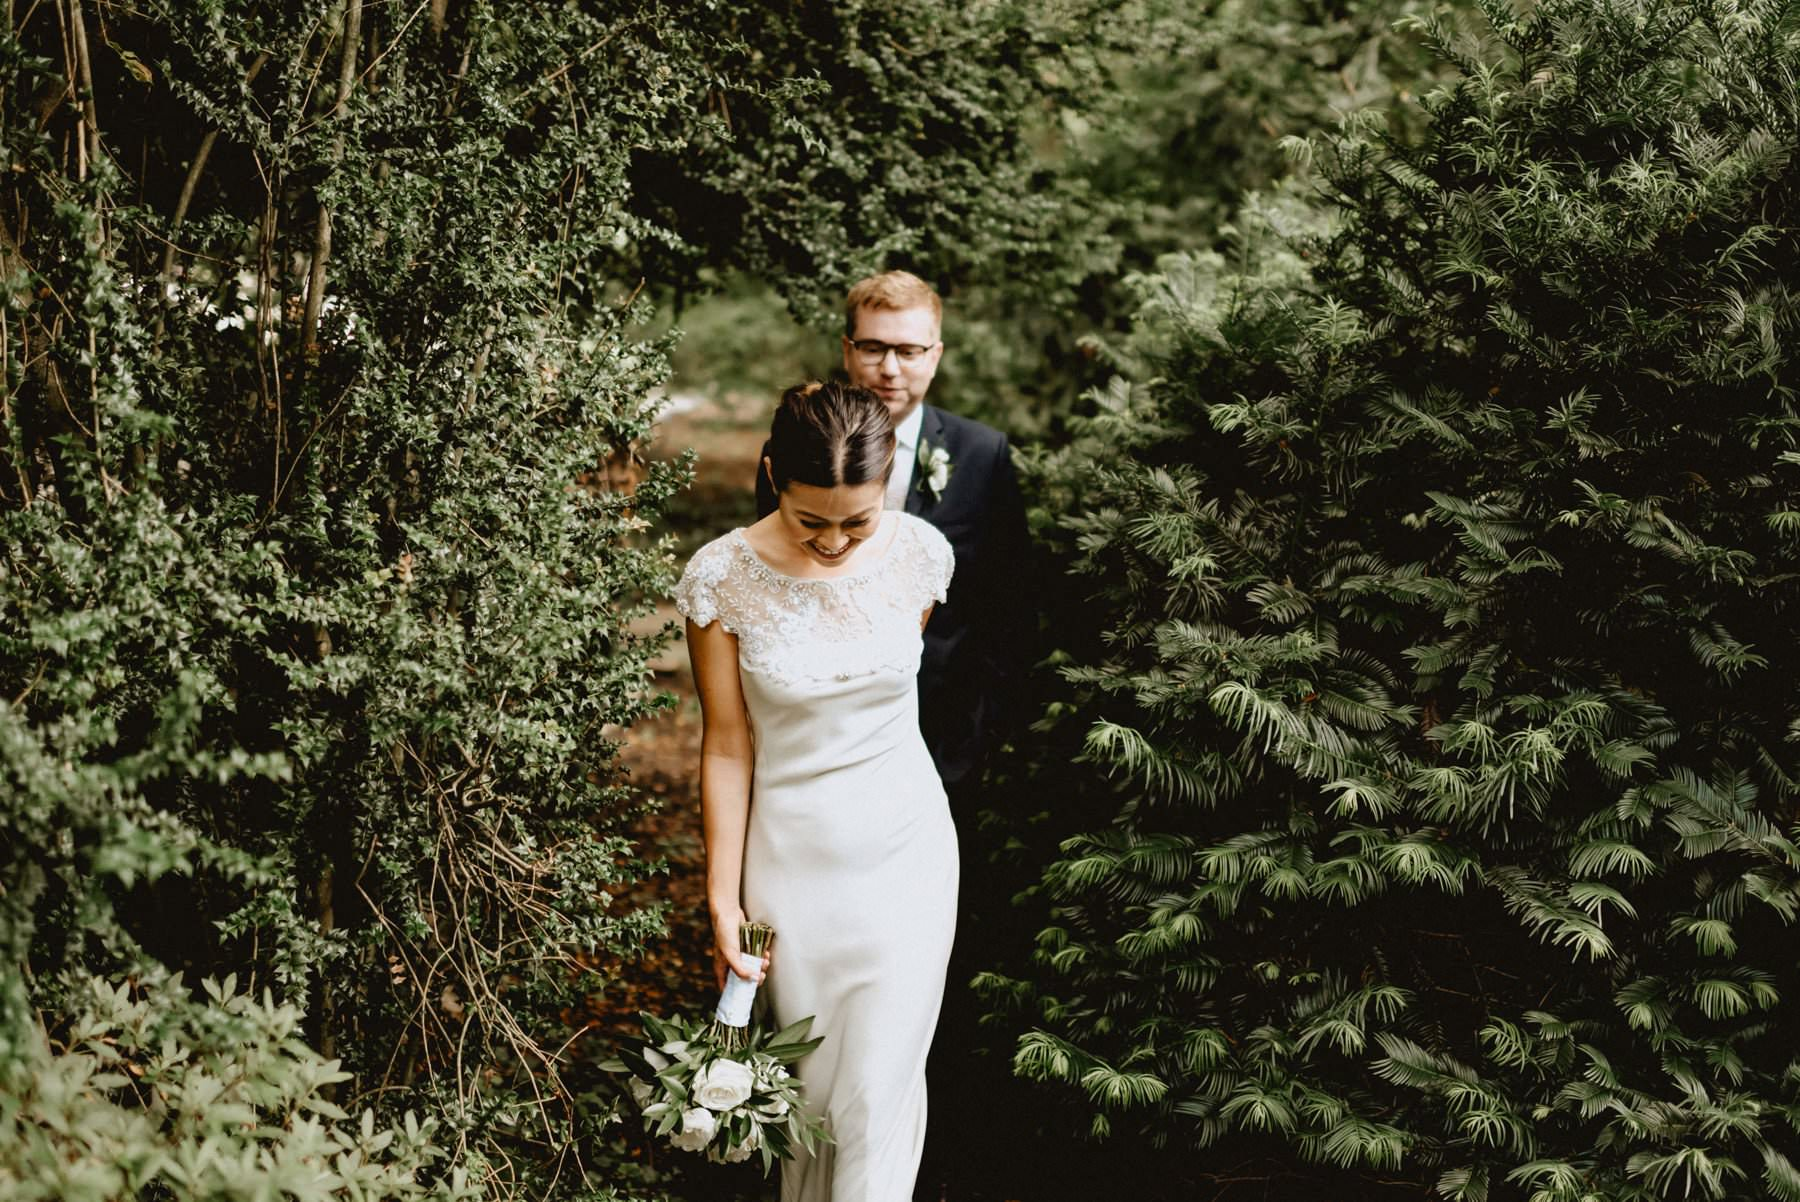 Appleford-estate-wedding-48.jpg